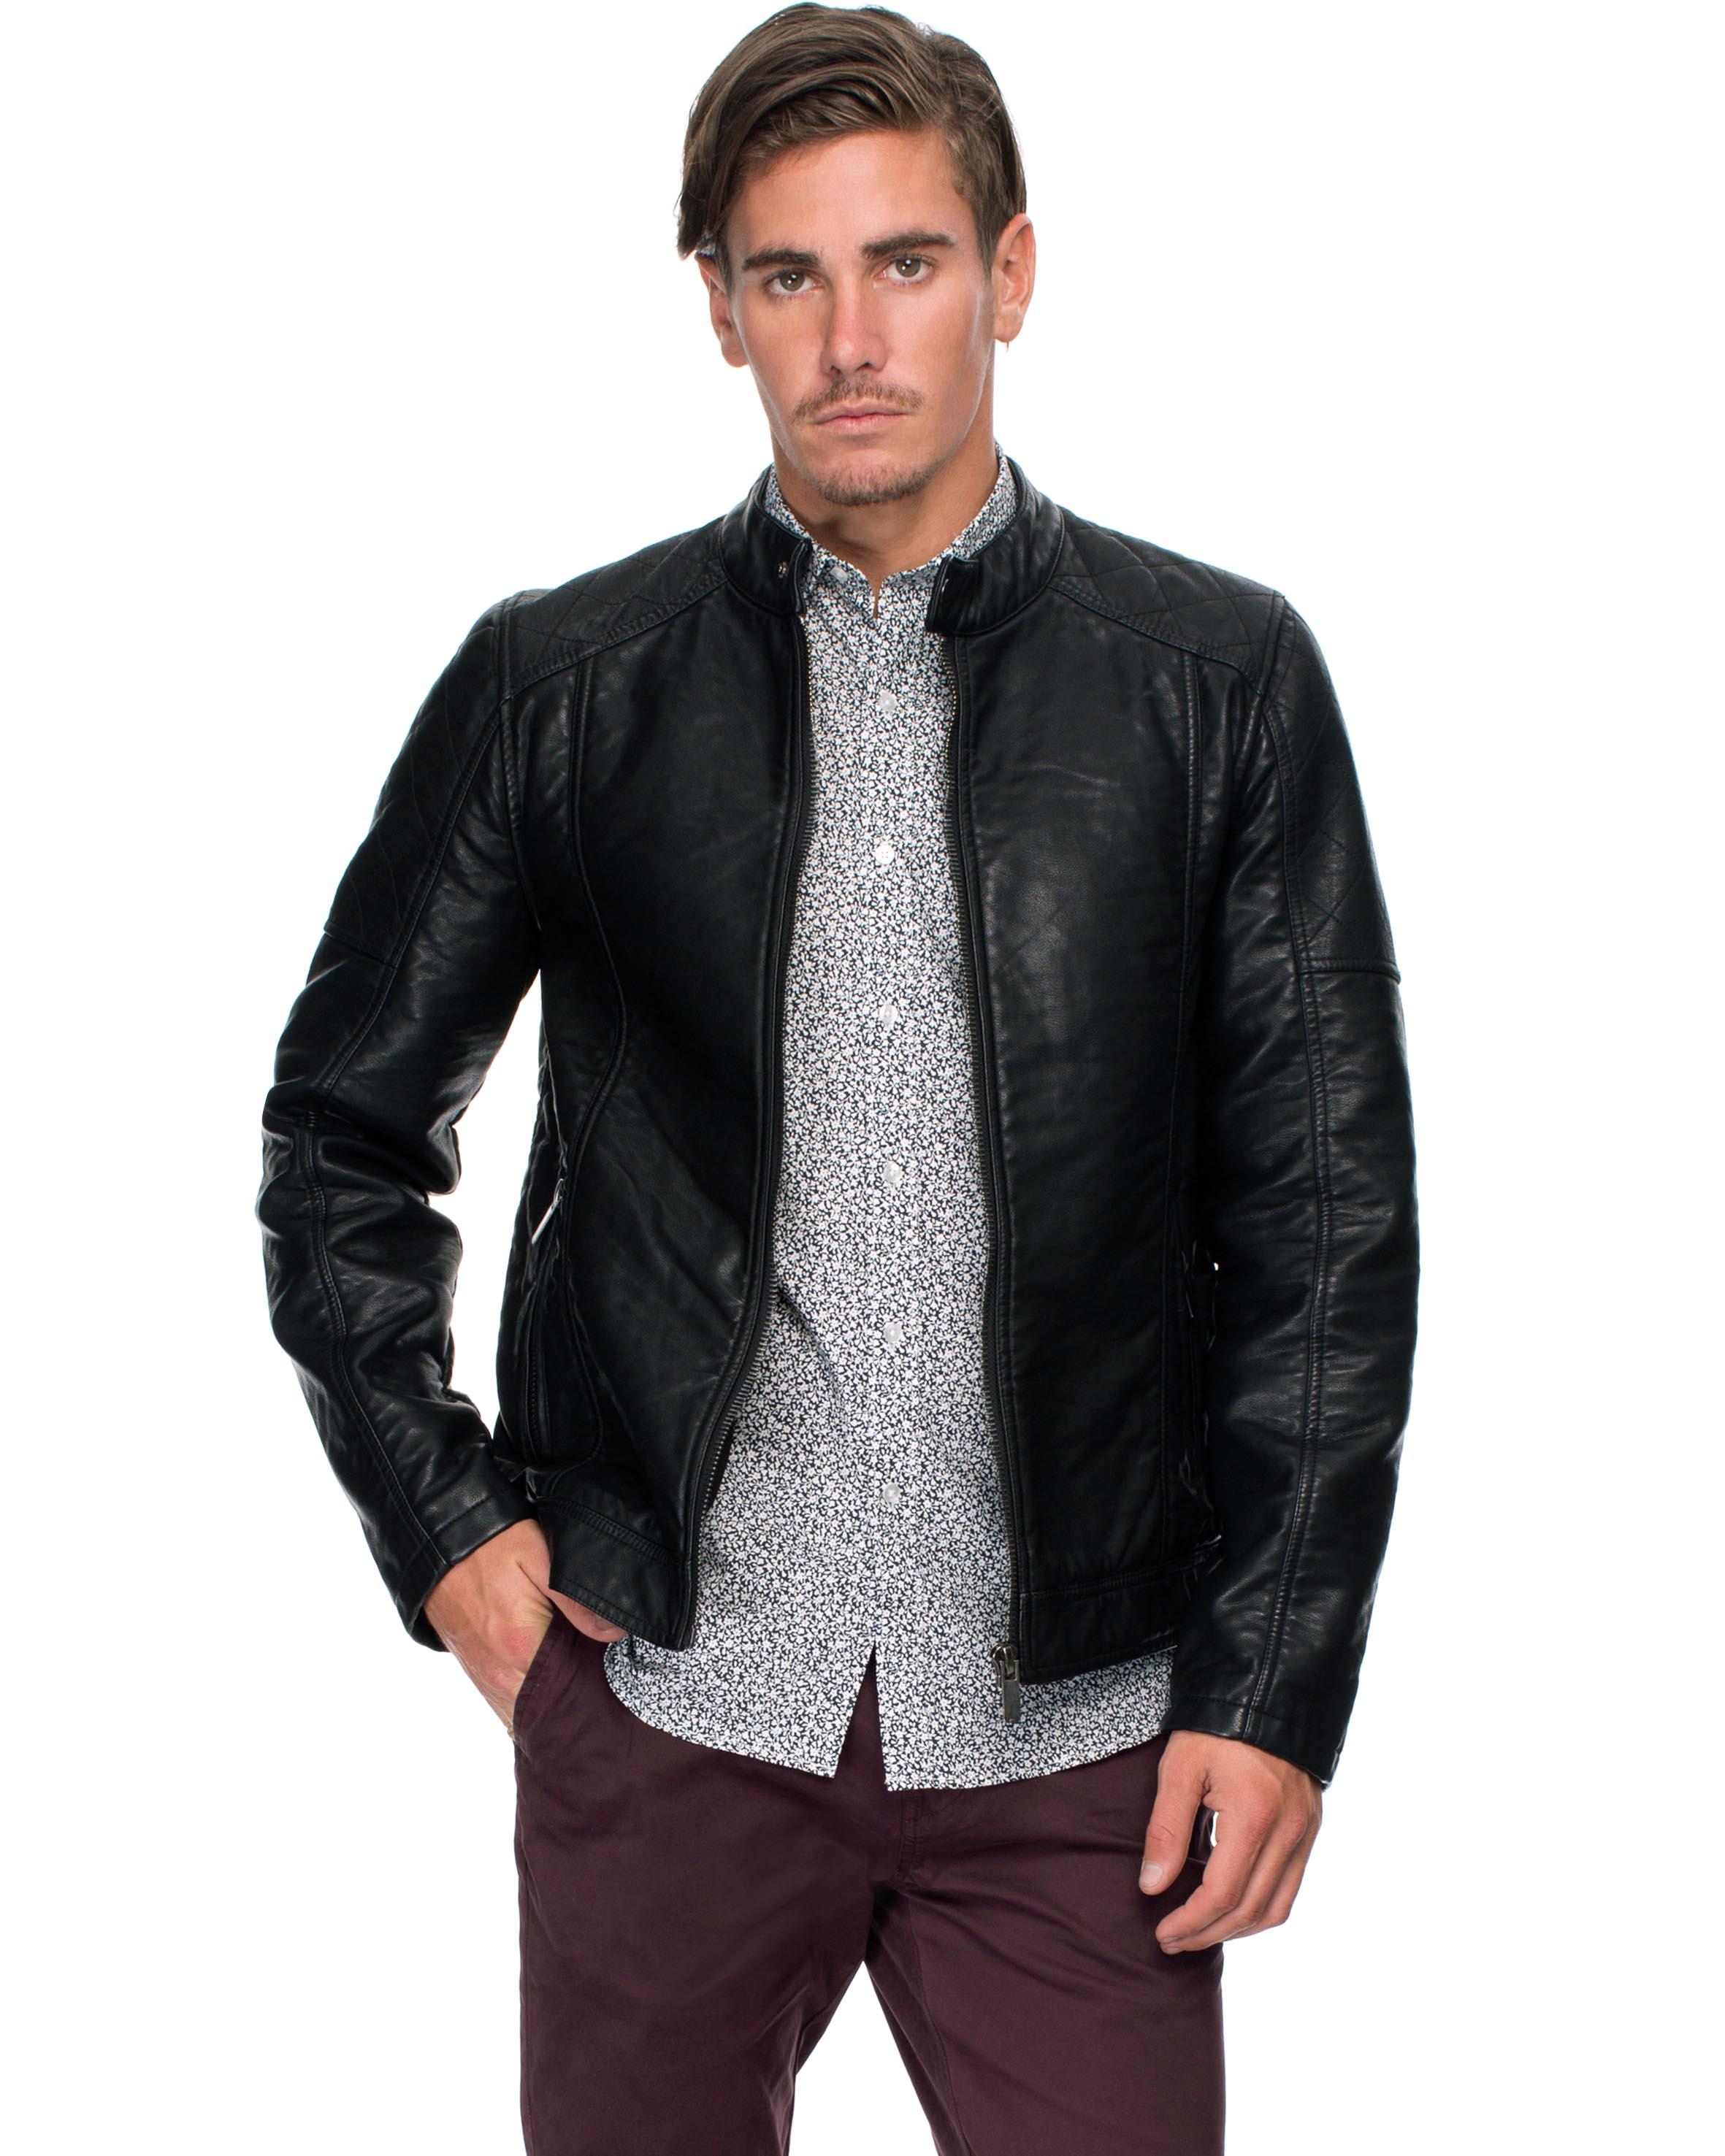 Leather Jackets | Mens Leather Jackets Online | Buy Leather Jacket